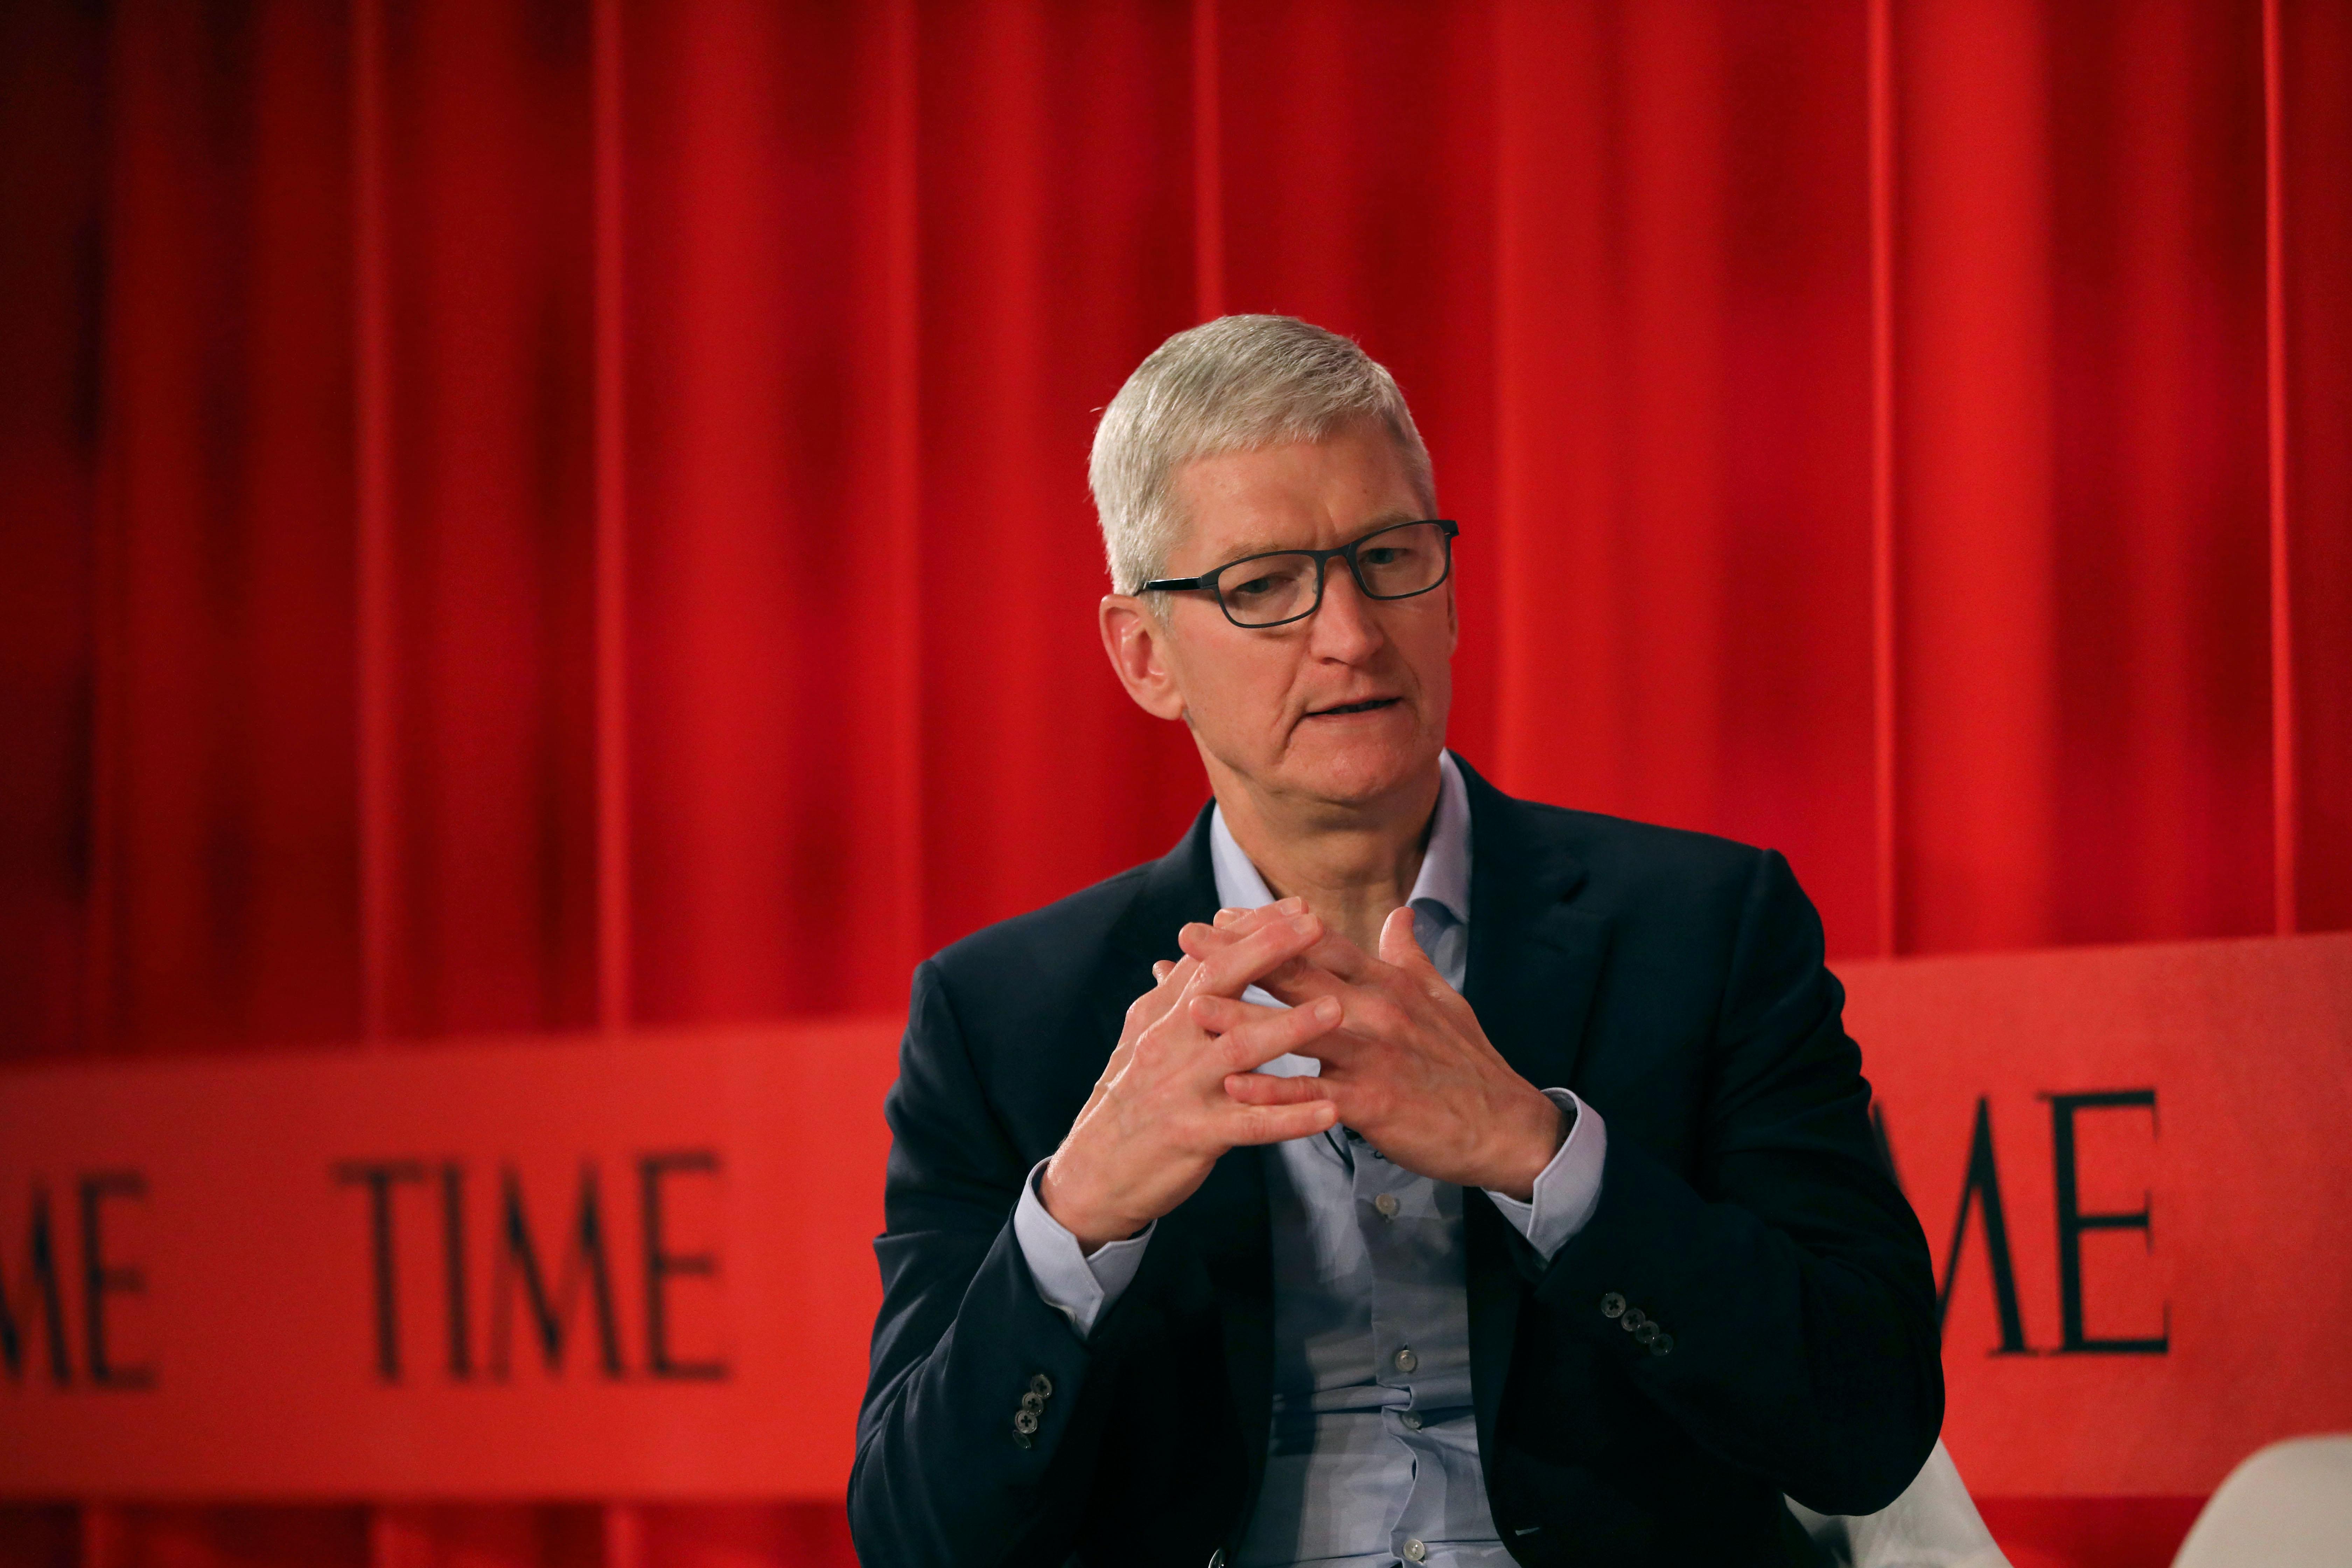 Elizabeth Warren wants to break up Big Tech. Tim Cook says keep Apple out of it.